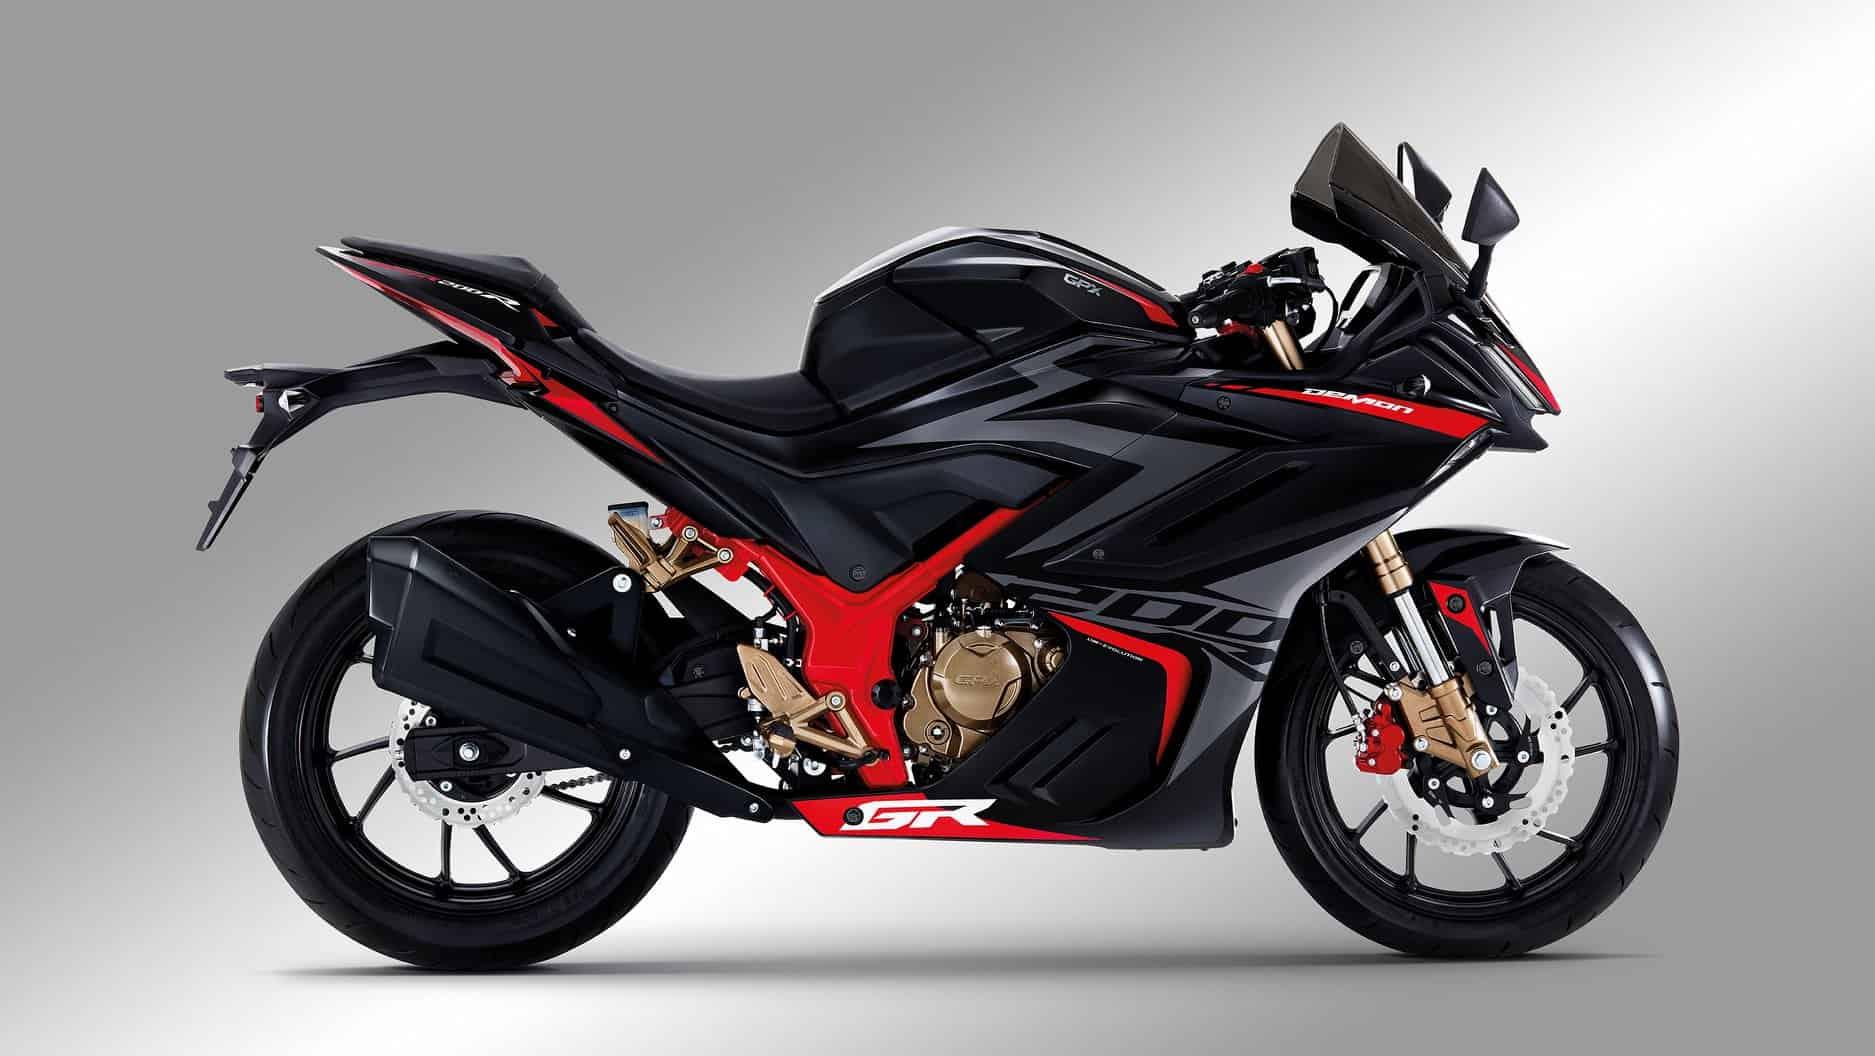 GR200R màu đen